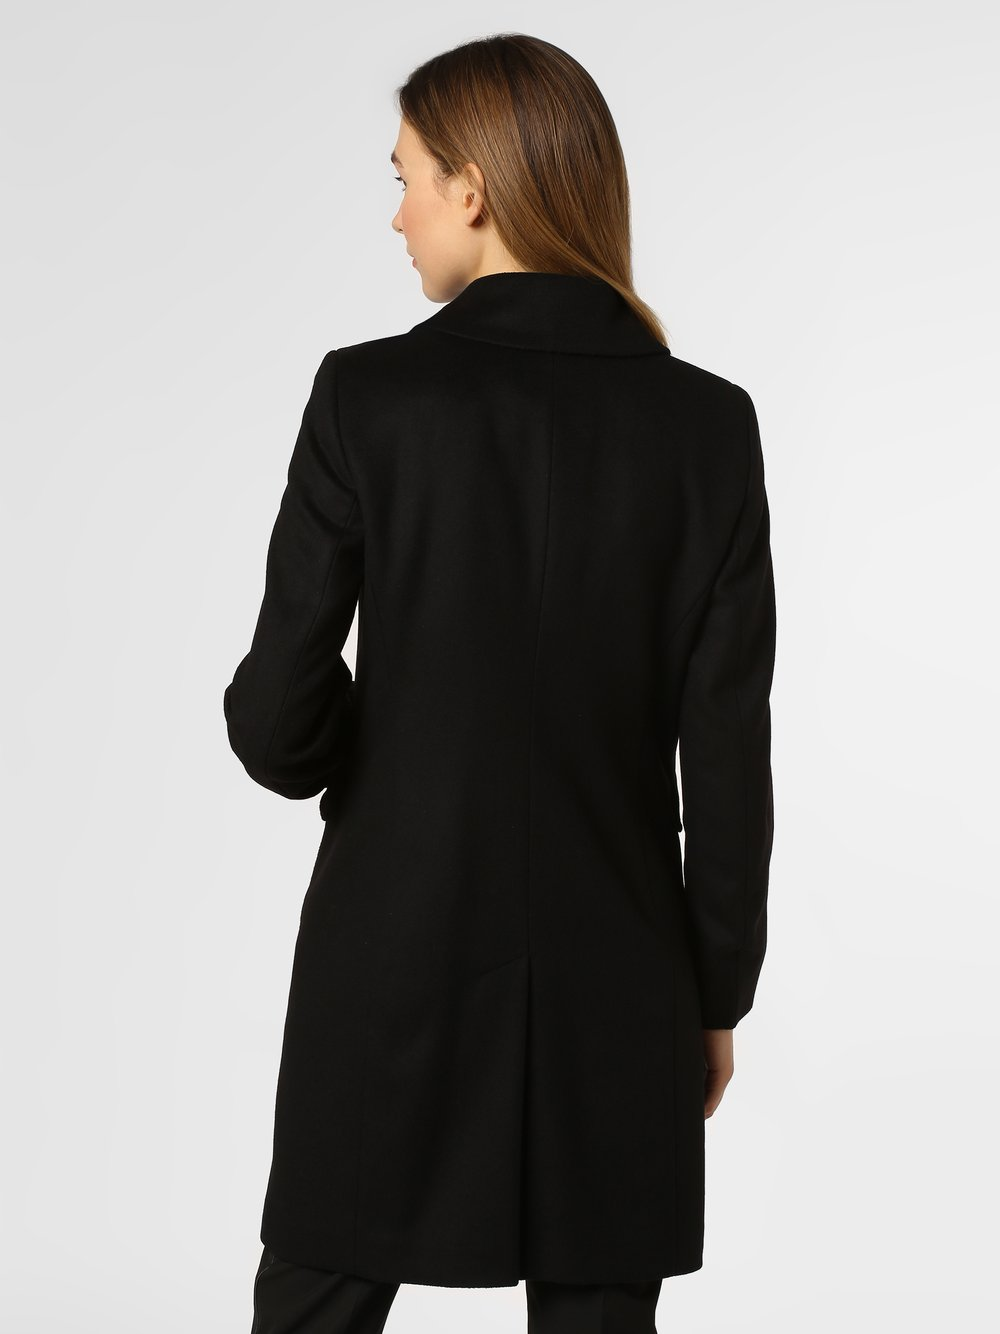 uni Damen Mantel mit Anteil schwarz Damen Cinque Cashmere pGqMUSzV